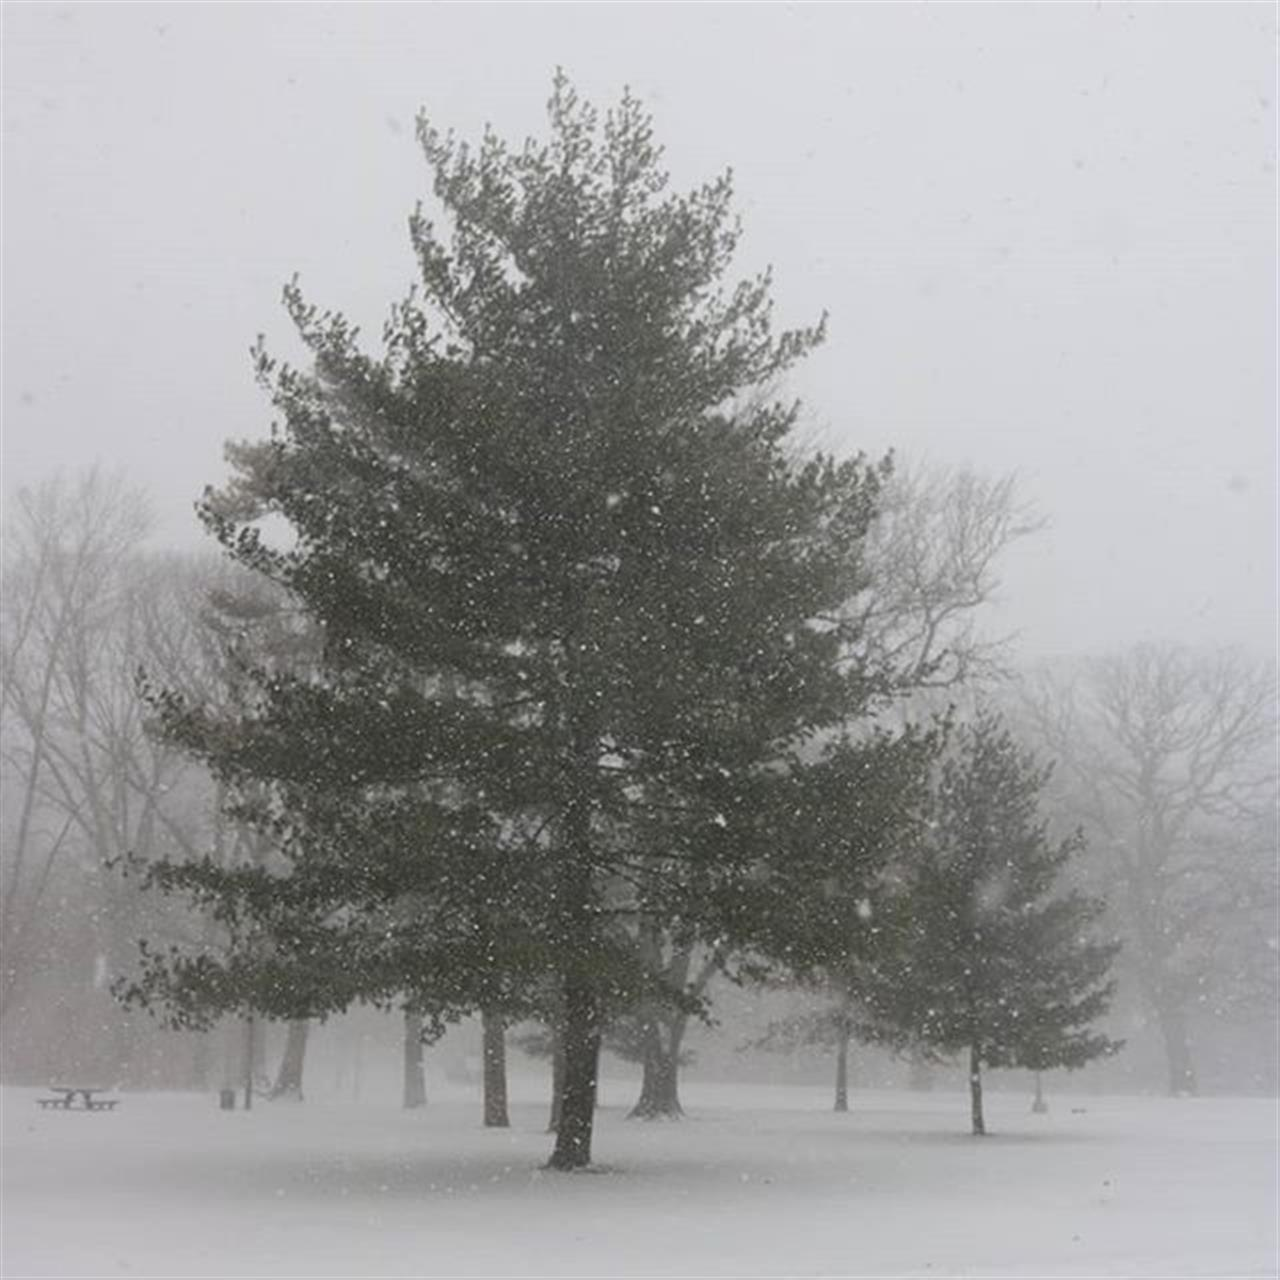 #prospectpark #trees #tree_magic #parks #picballot #eye_for_earth #snowstorm #snowÔØä #naturelover #naturephotography #nature #yourshot #beautifulday #beautiful #Exploreyourhood #leadingrelocal #itsthesimlpethings #itsamazingoutthere #Grayson #winterstormgrayson2018